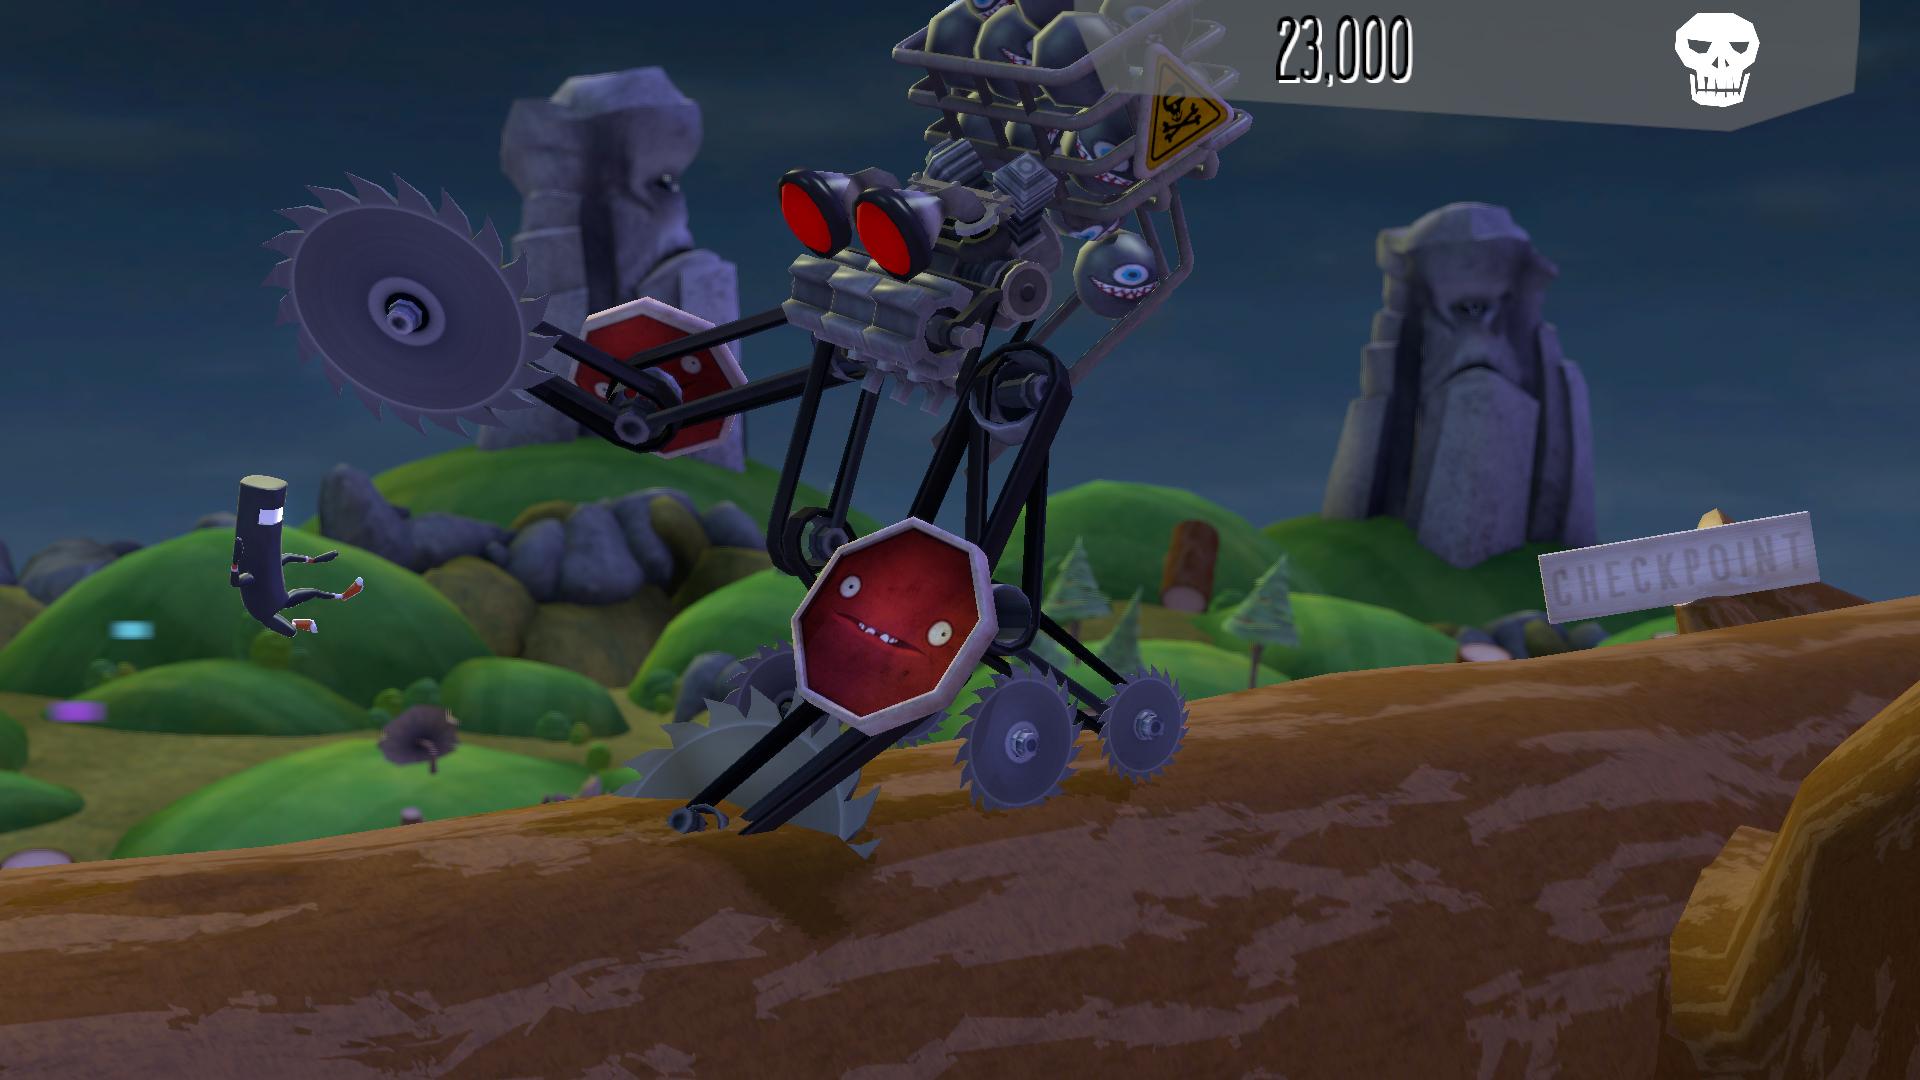 BIT.TRIP Presents... Runner2: Future Legend of Rhythm Alien screenshot